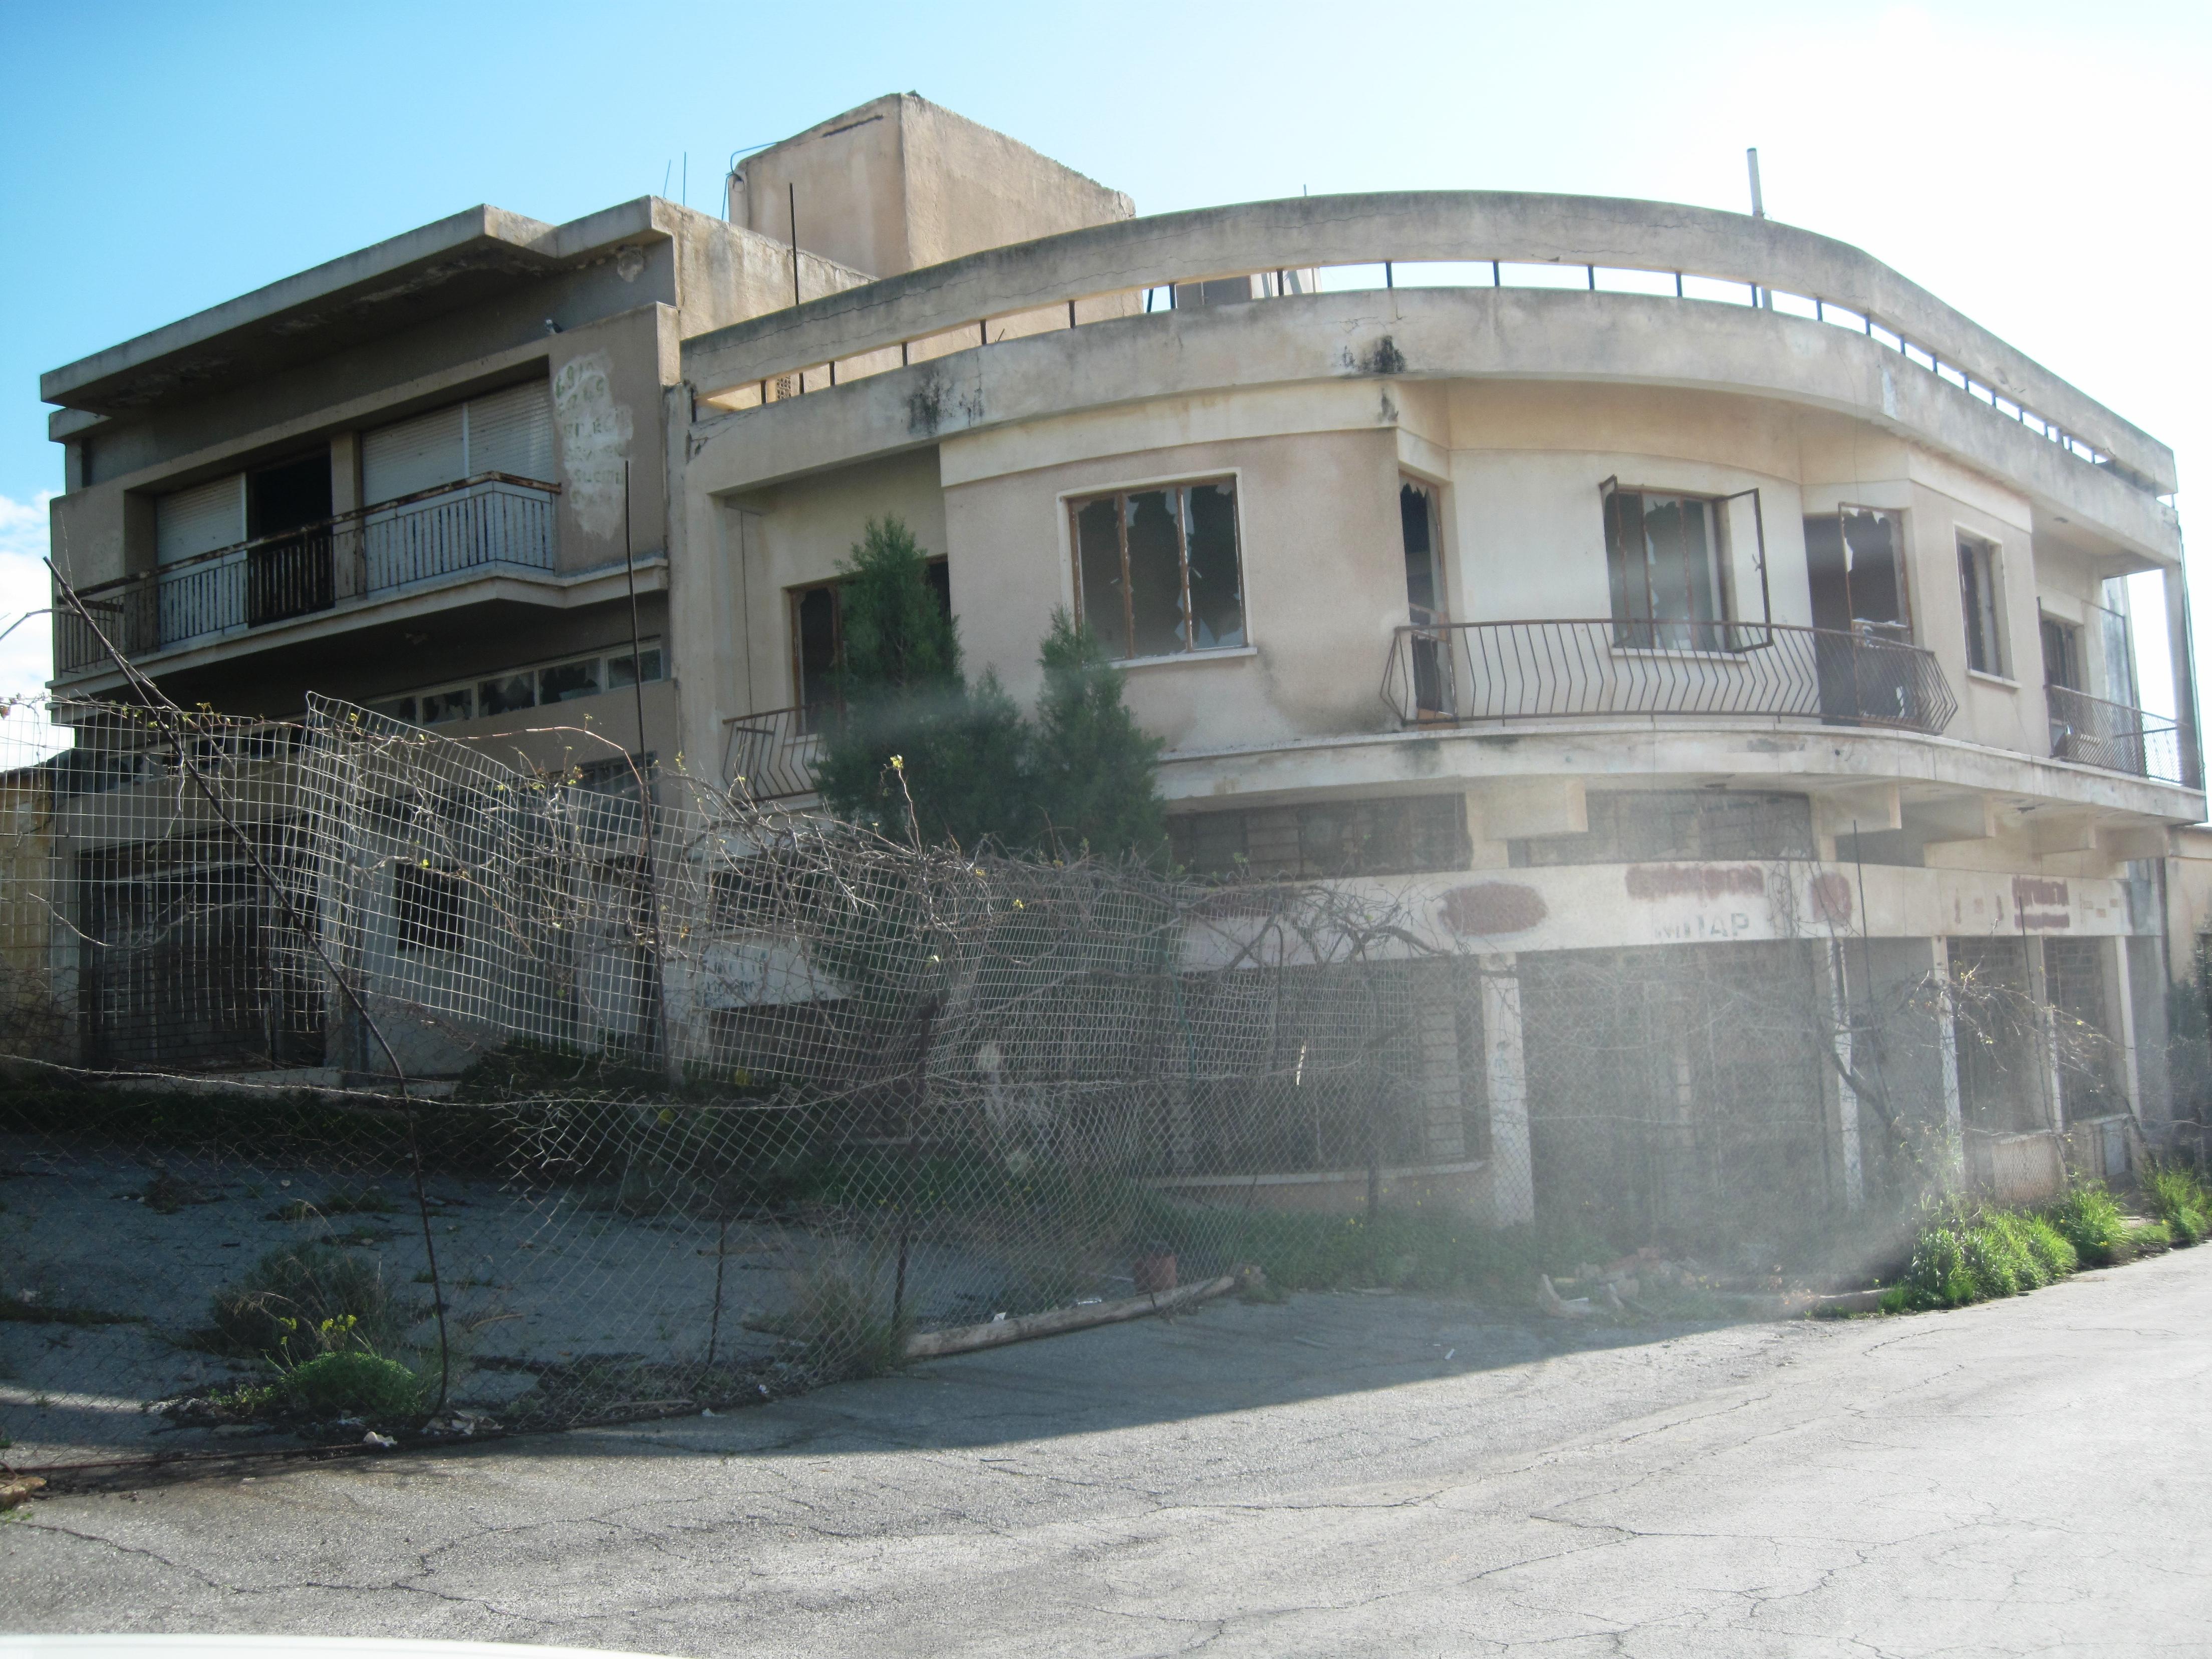 https://upload.wikimedia.org/wikipedia/commons/4/4b/Cyprus_-_Famagusta_Varosha_03.JPG